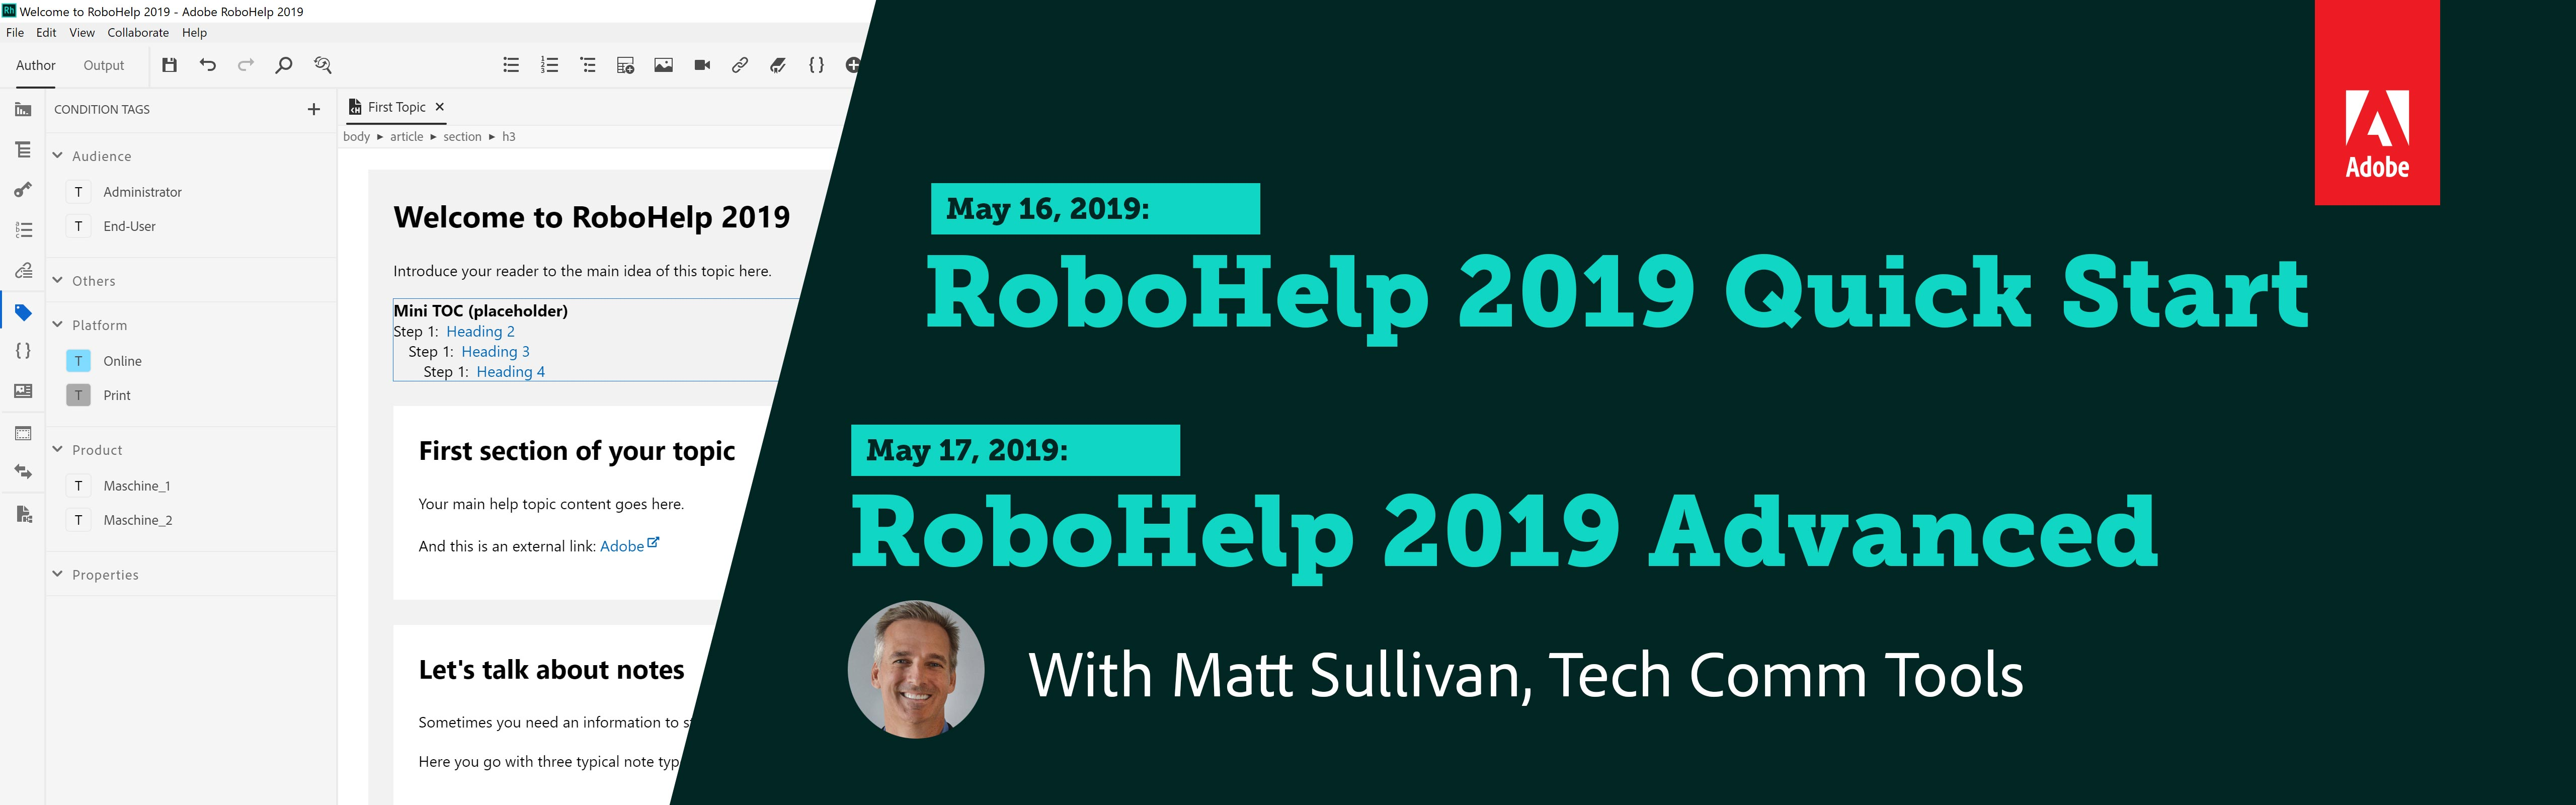 2018-05-16-17-Matt-Sullivan-RoboHelp-2019-Attendease.jpg